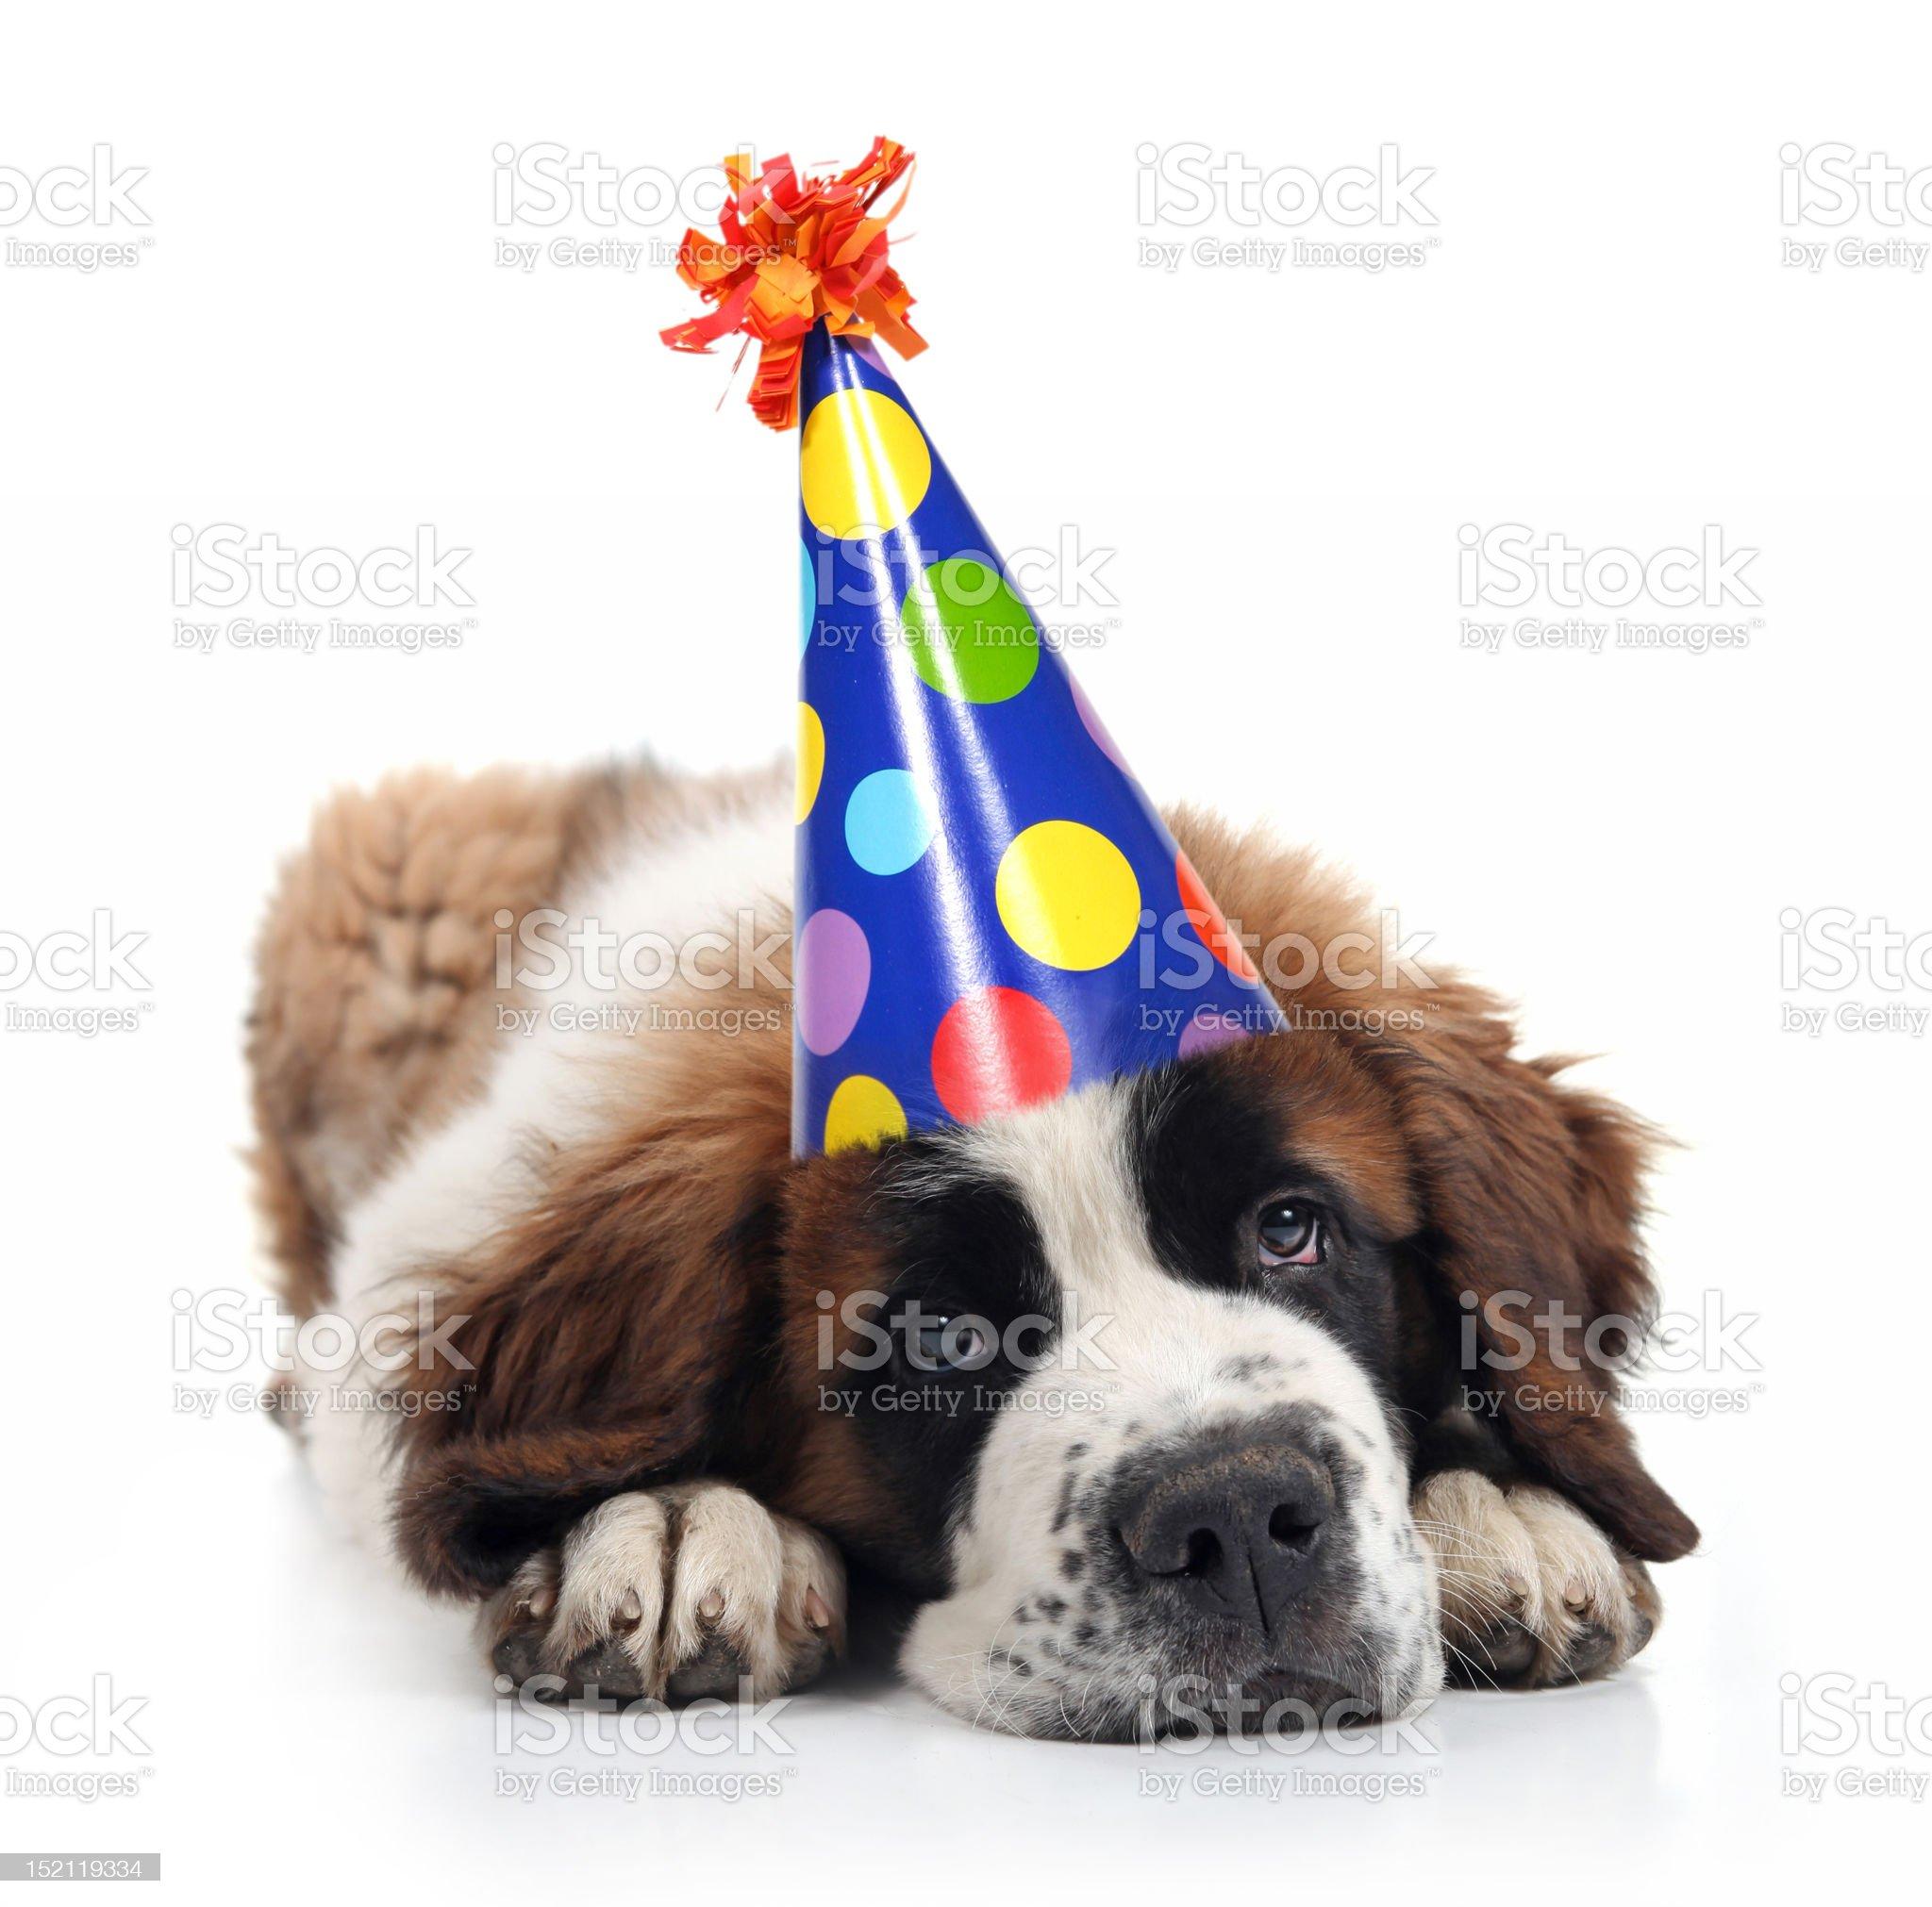 Saint Bernard Unhappy About His Birthday royalty-free stock photo